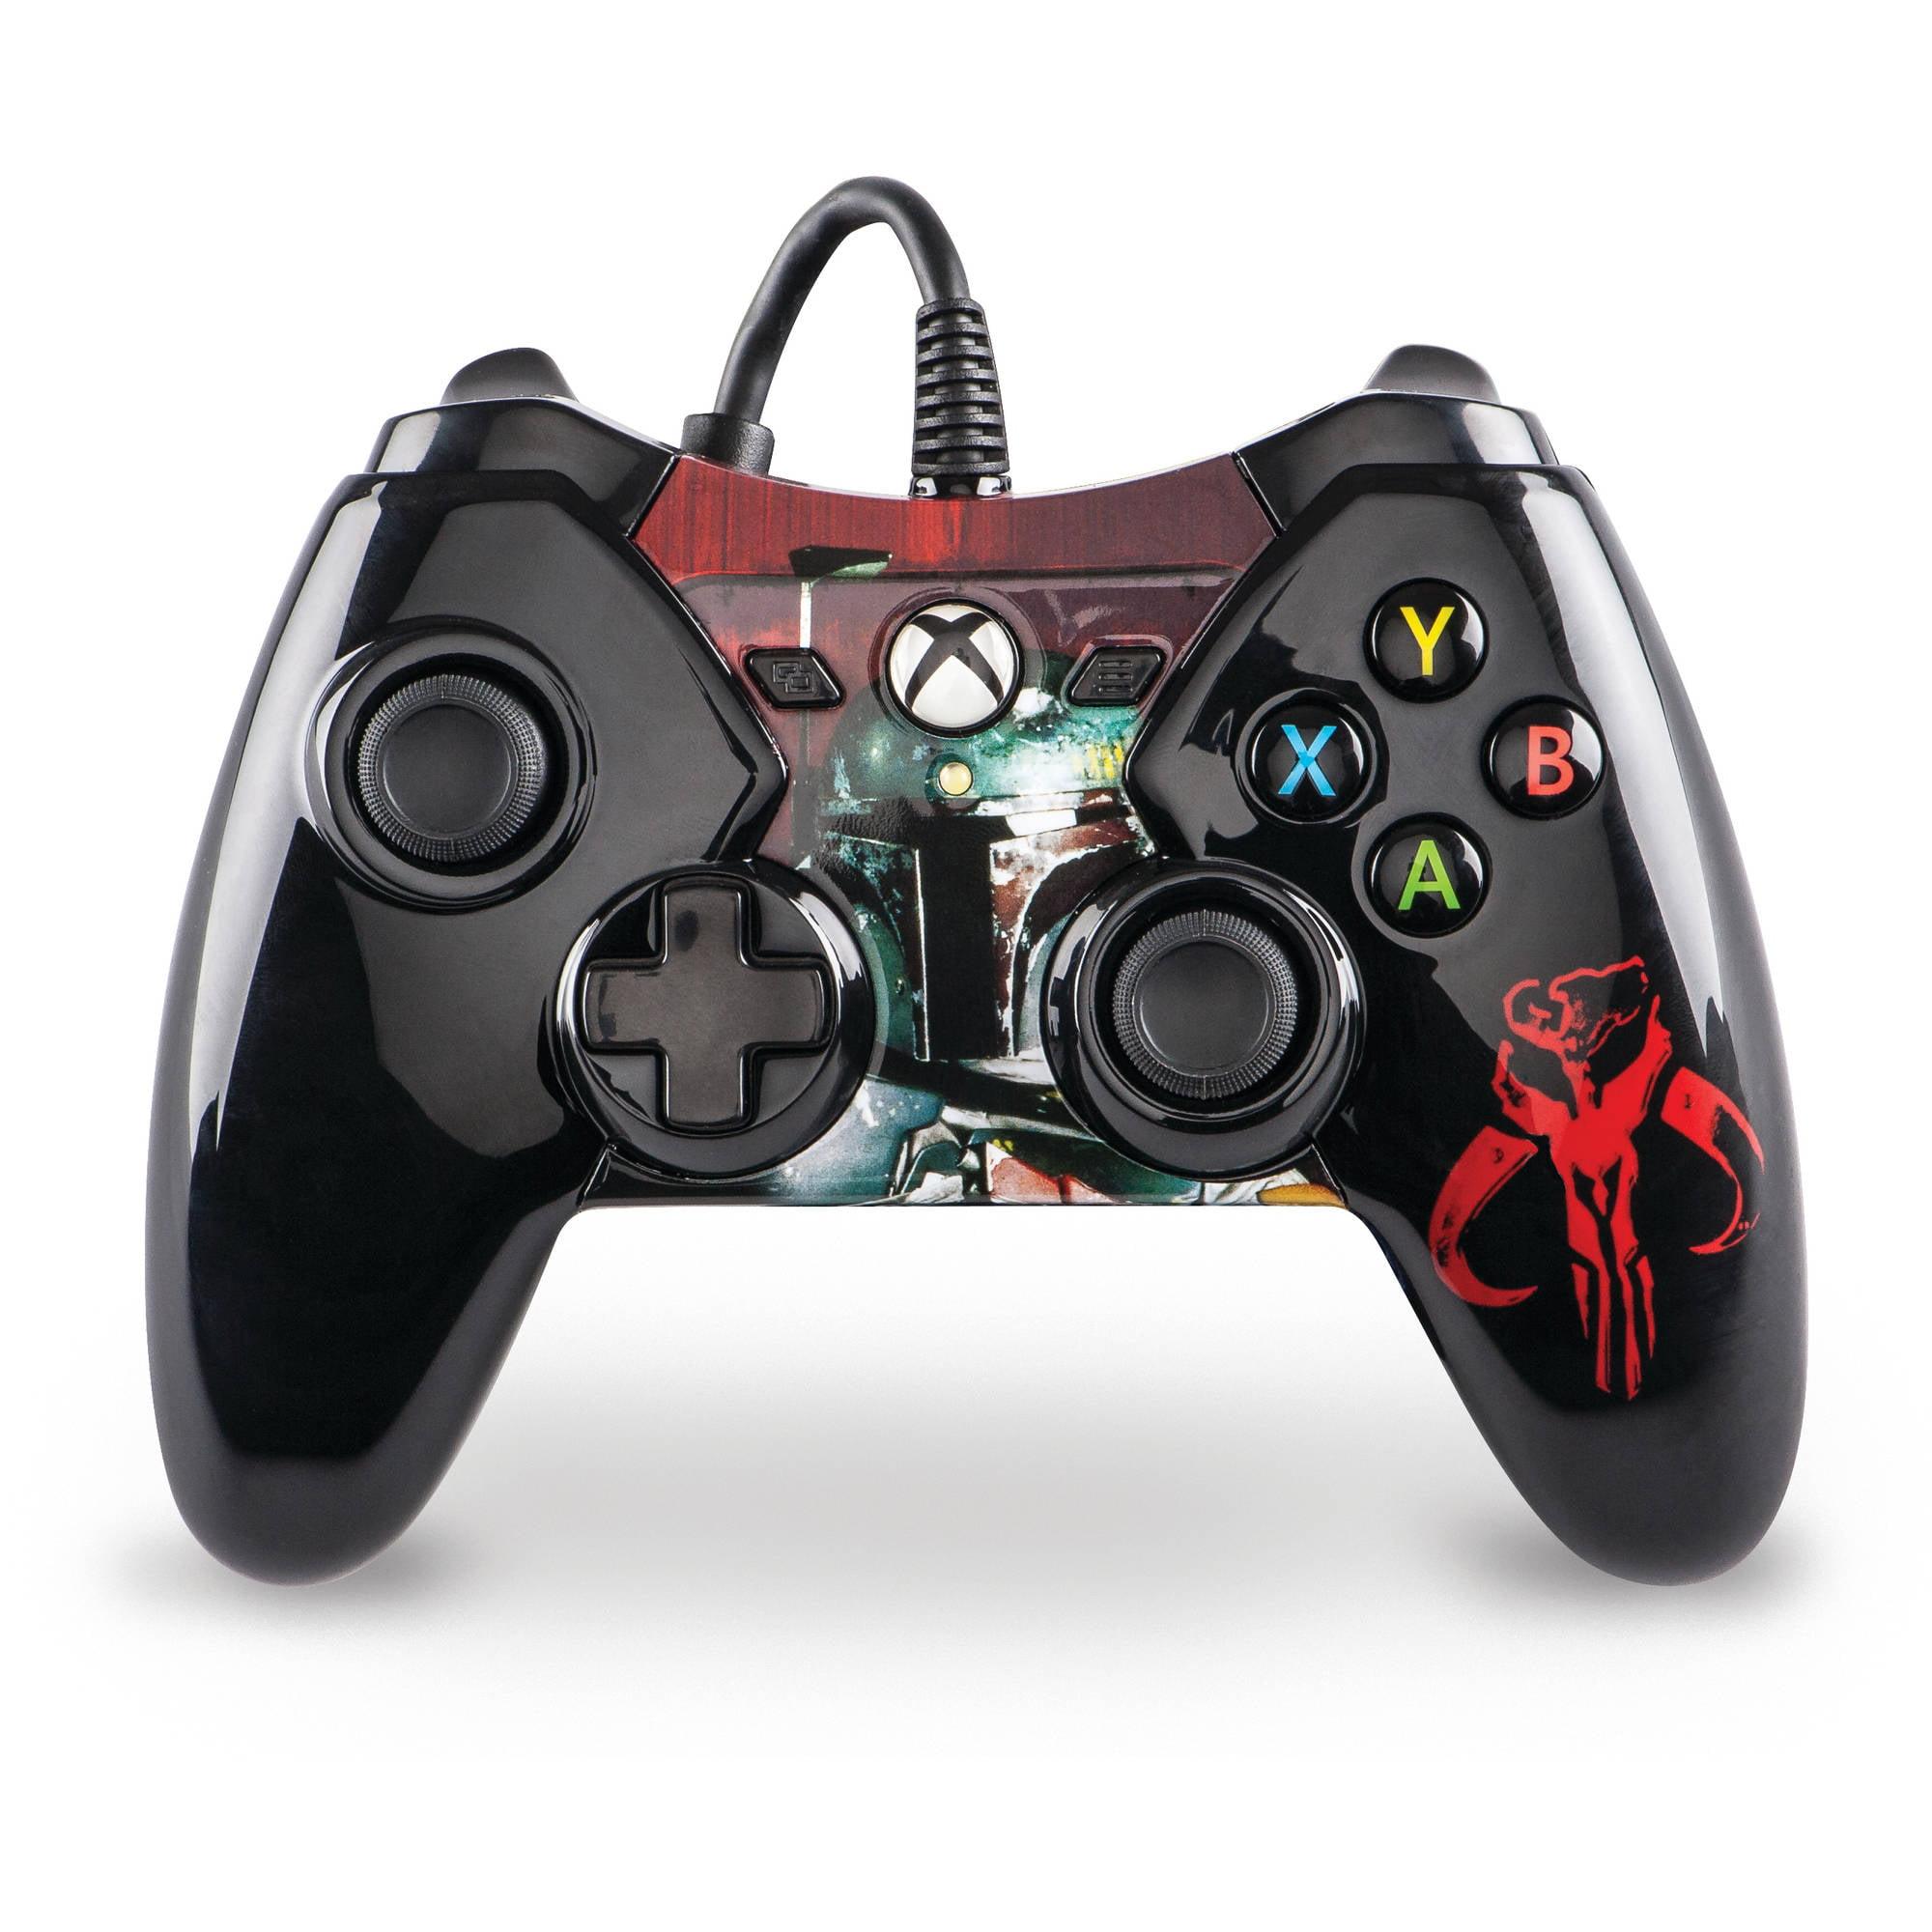 Xbox One Wired Star Wars Boba Fett Controller - Walmart.com